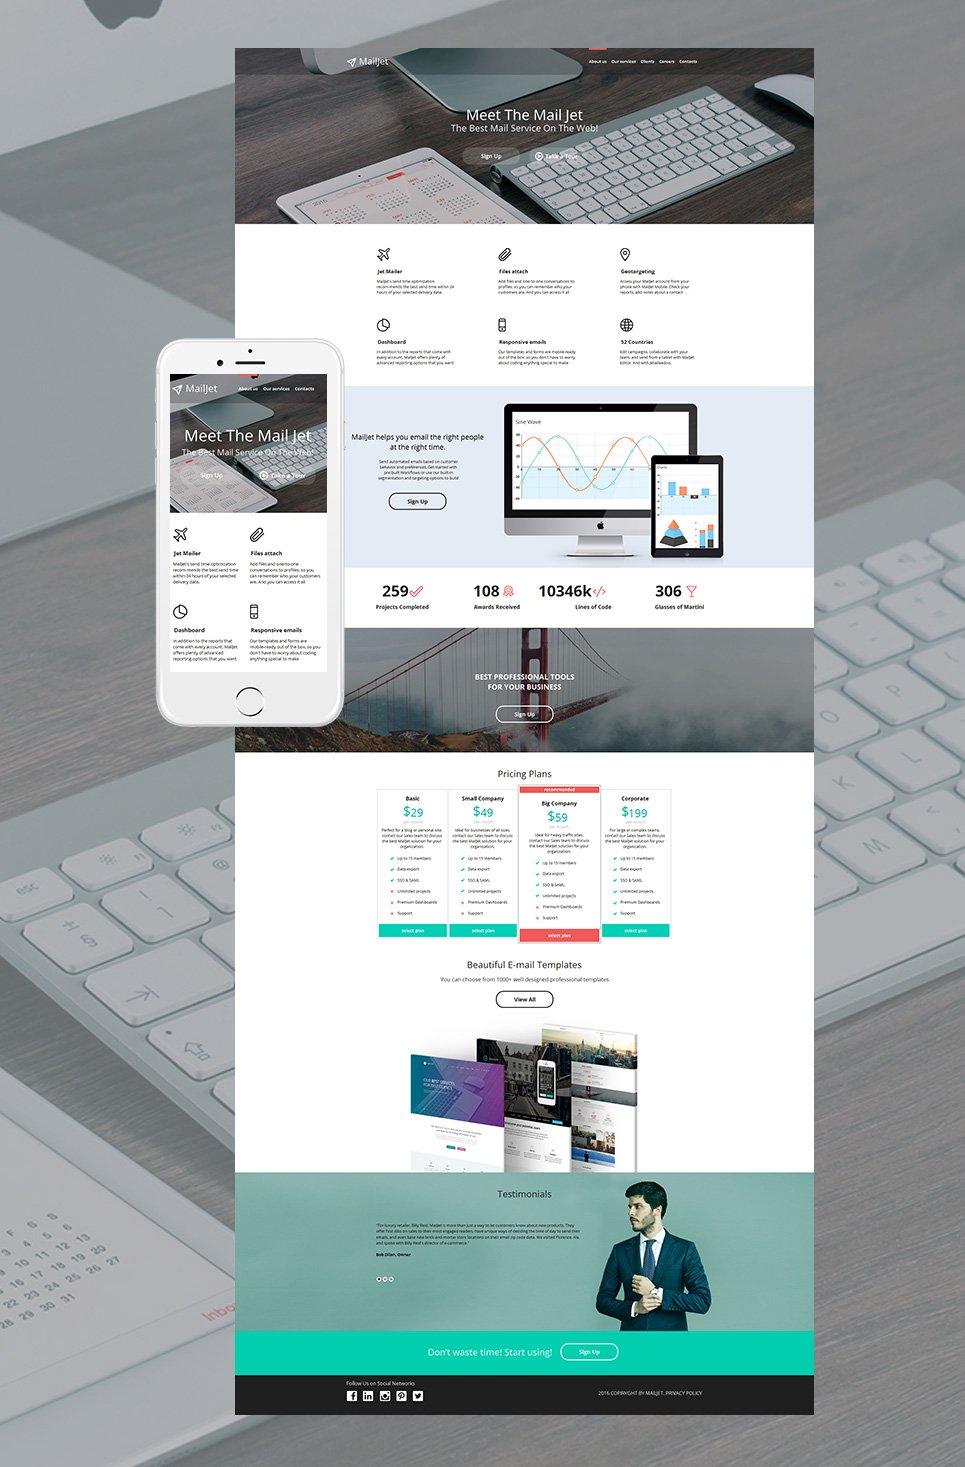 MailJet html HTML Website Template - image